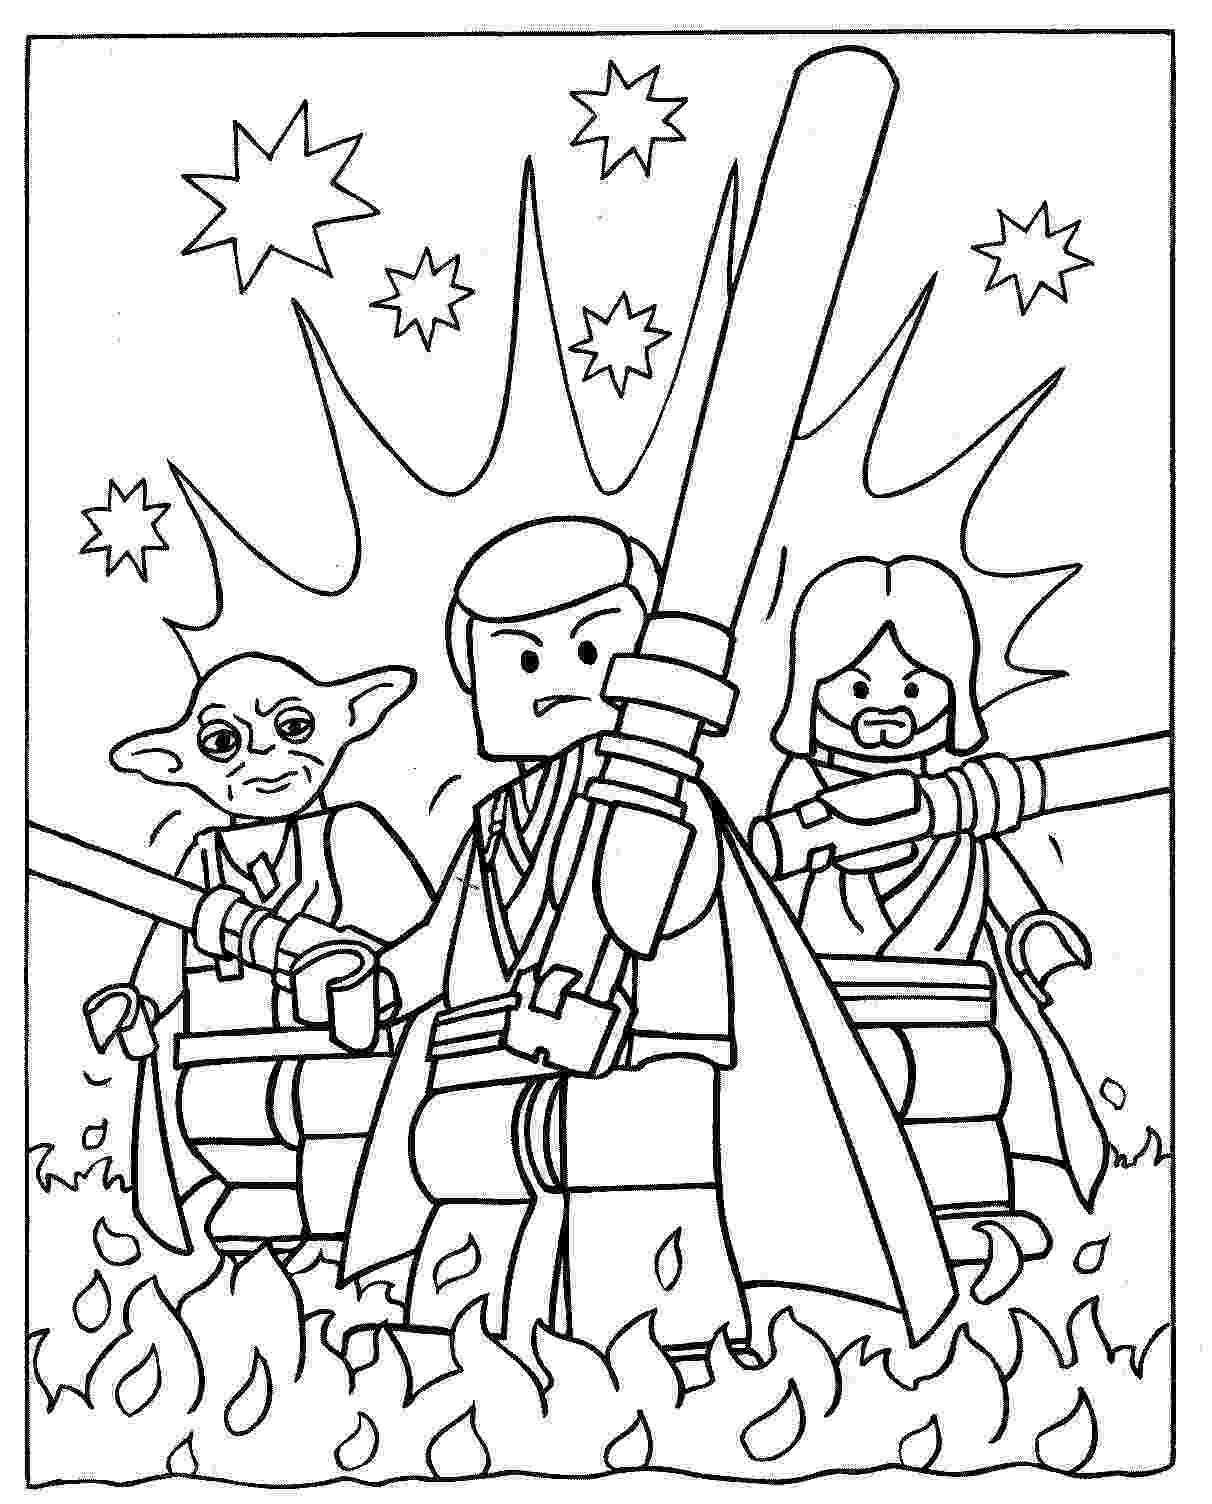 star wars colouring printables lego star wars clone wars coloring page free printable star wars printables colouring